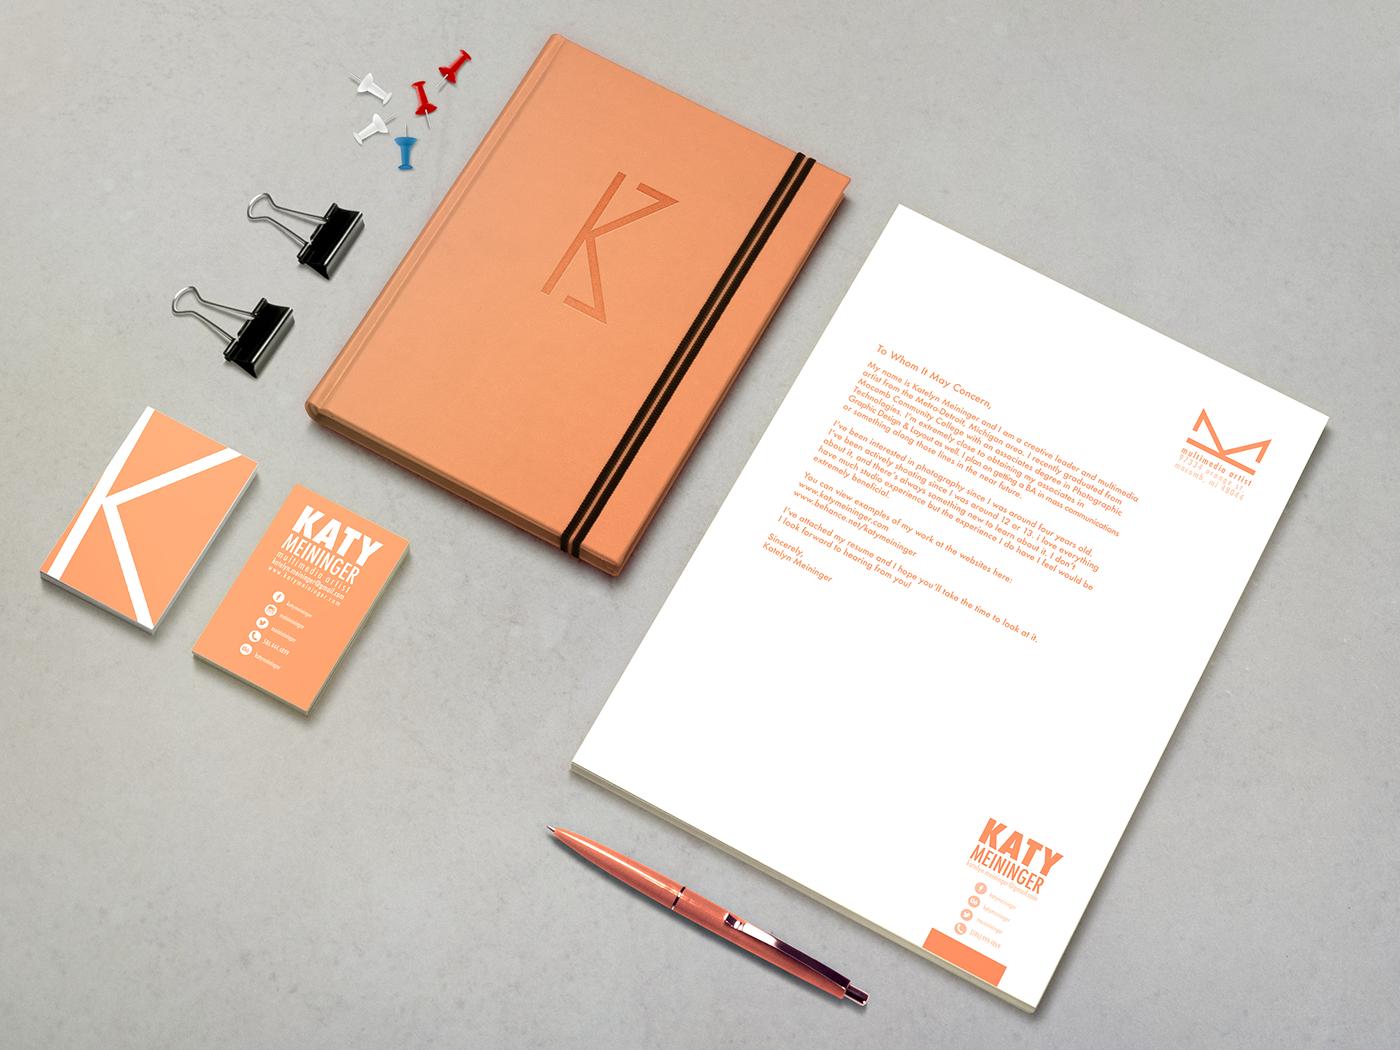 Personal Branding - Katy Meininger on Behance